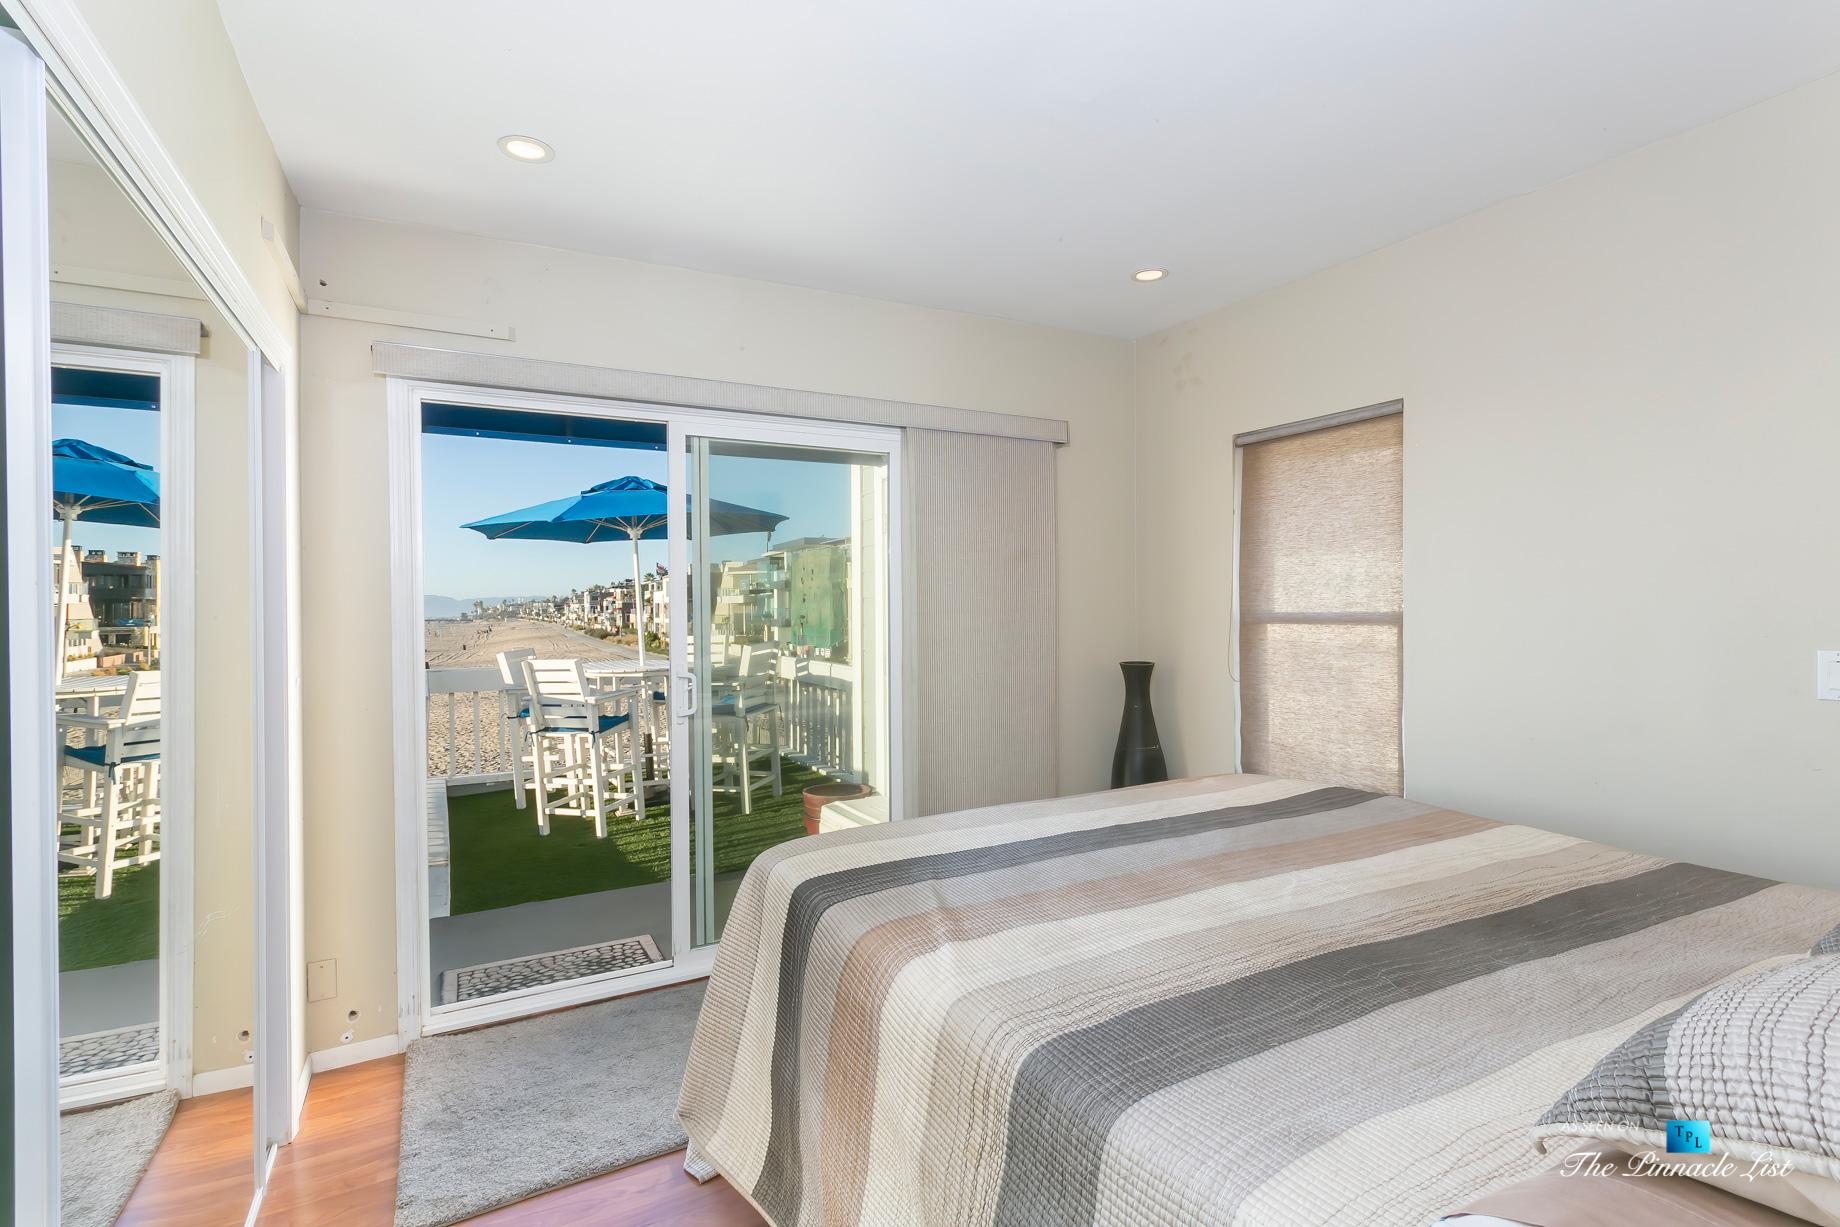 3500 The Strand, Hermosa Beach, CA, USA - Beachfront Bedroom – Luxury Real Estate – Original 90210 Beach House - Oceanfront Home